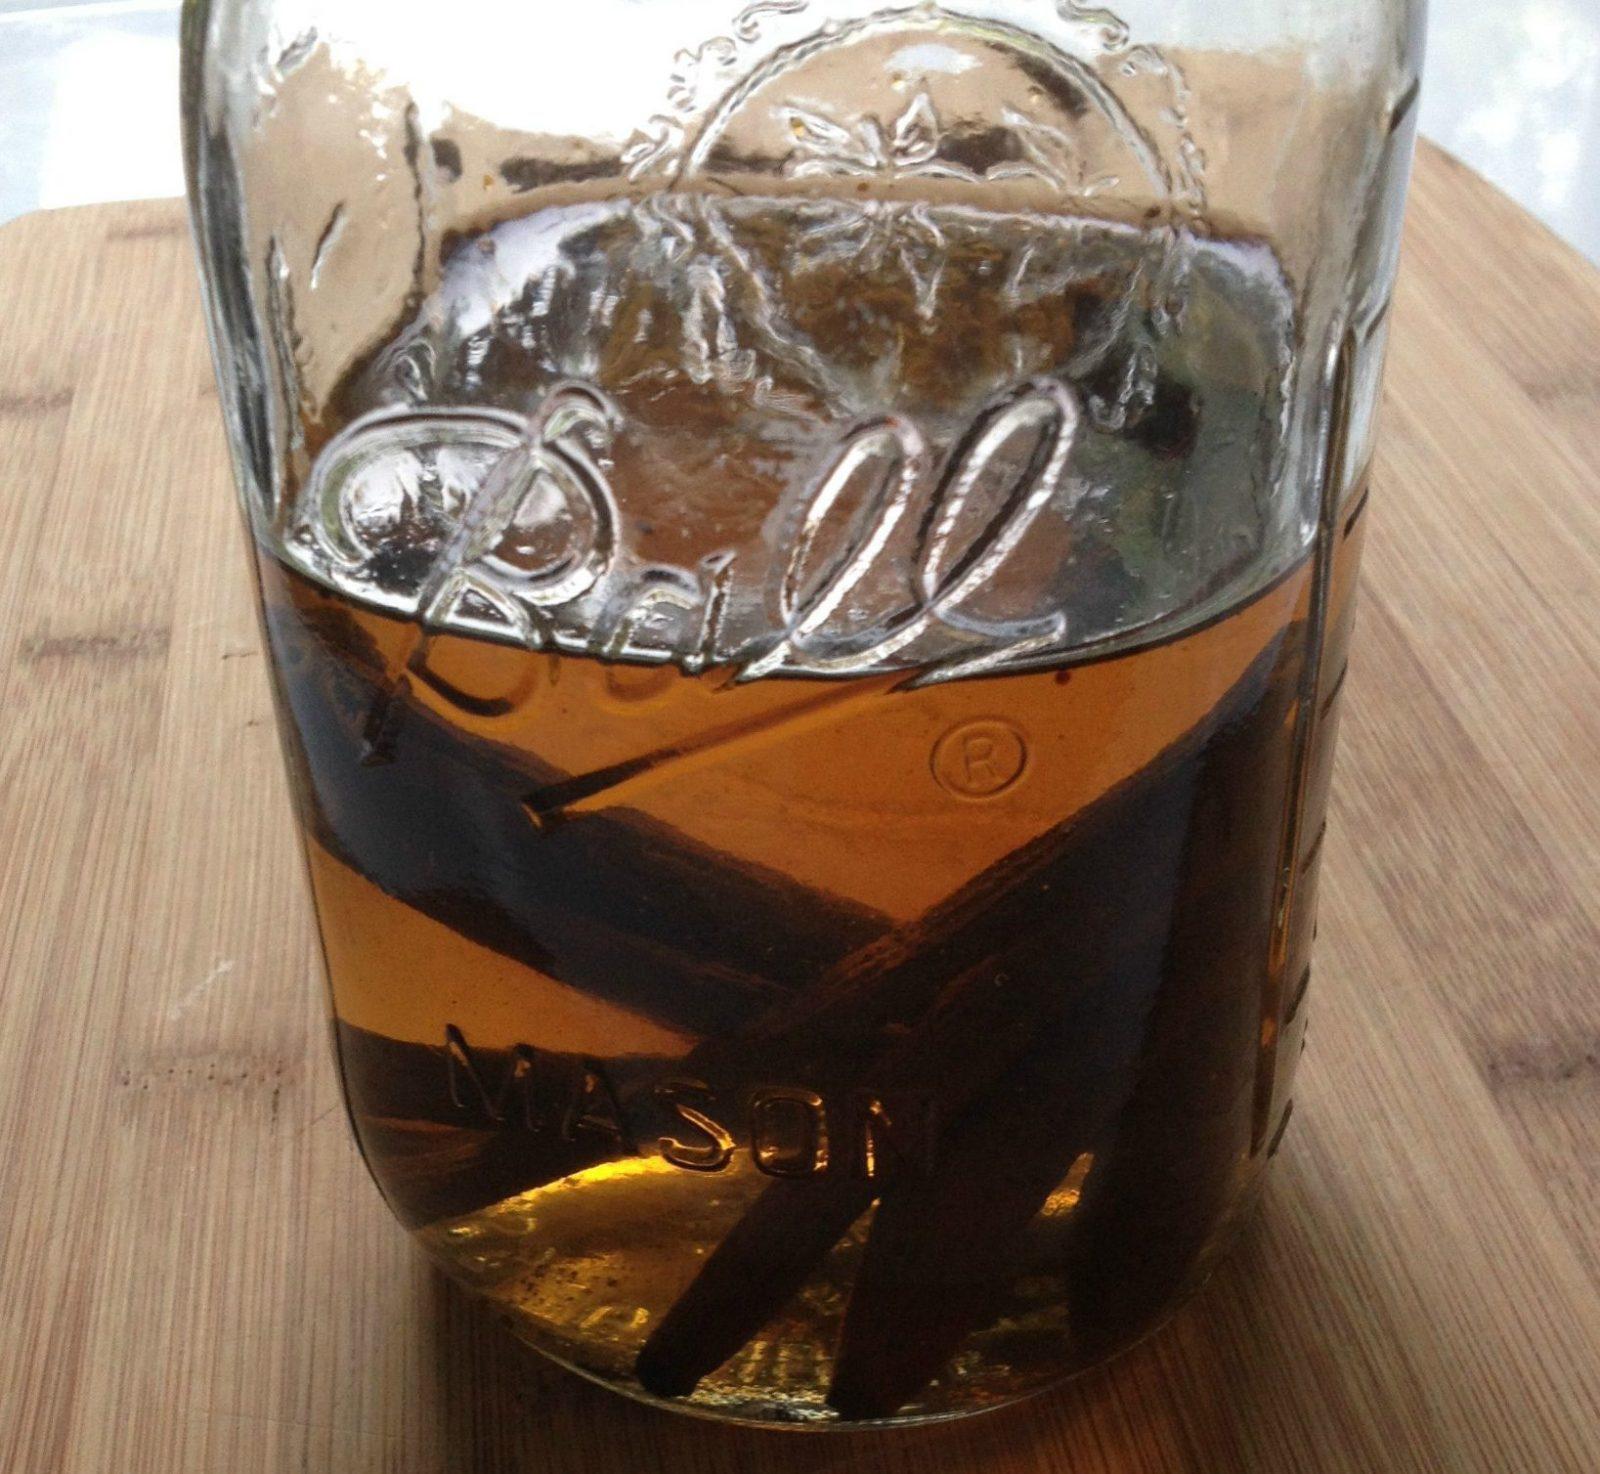 vanilla beans soaking in a quart mason jar